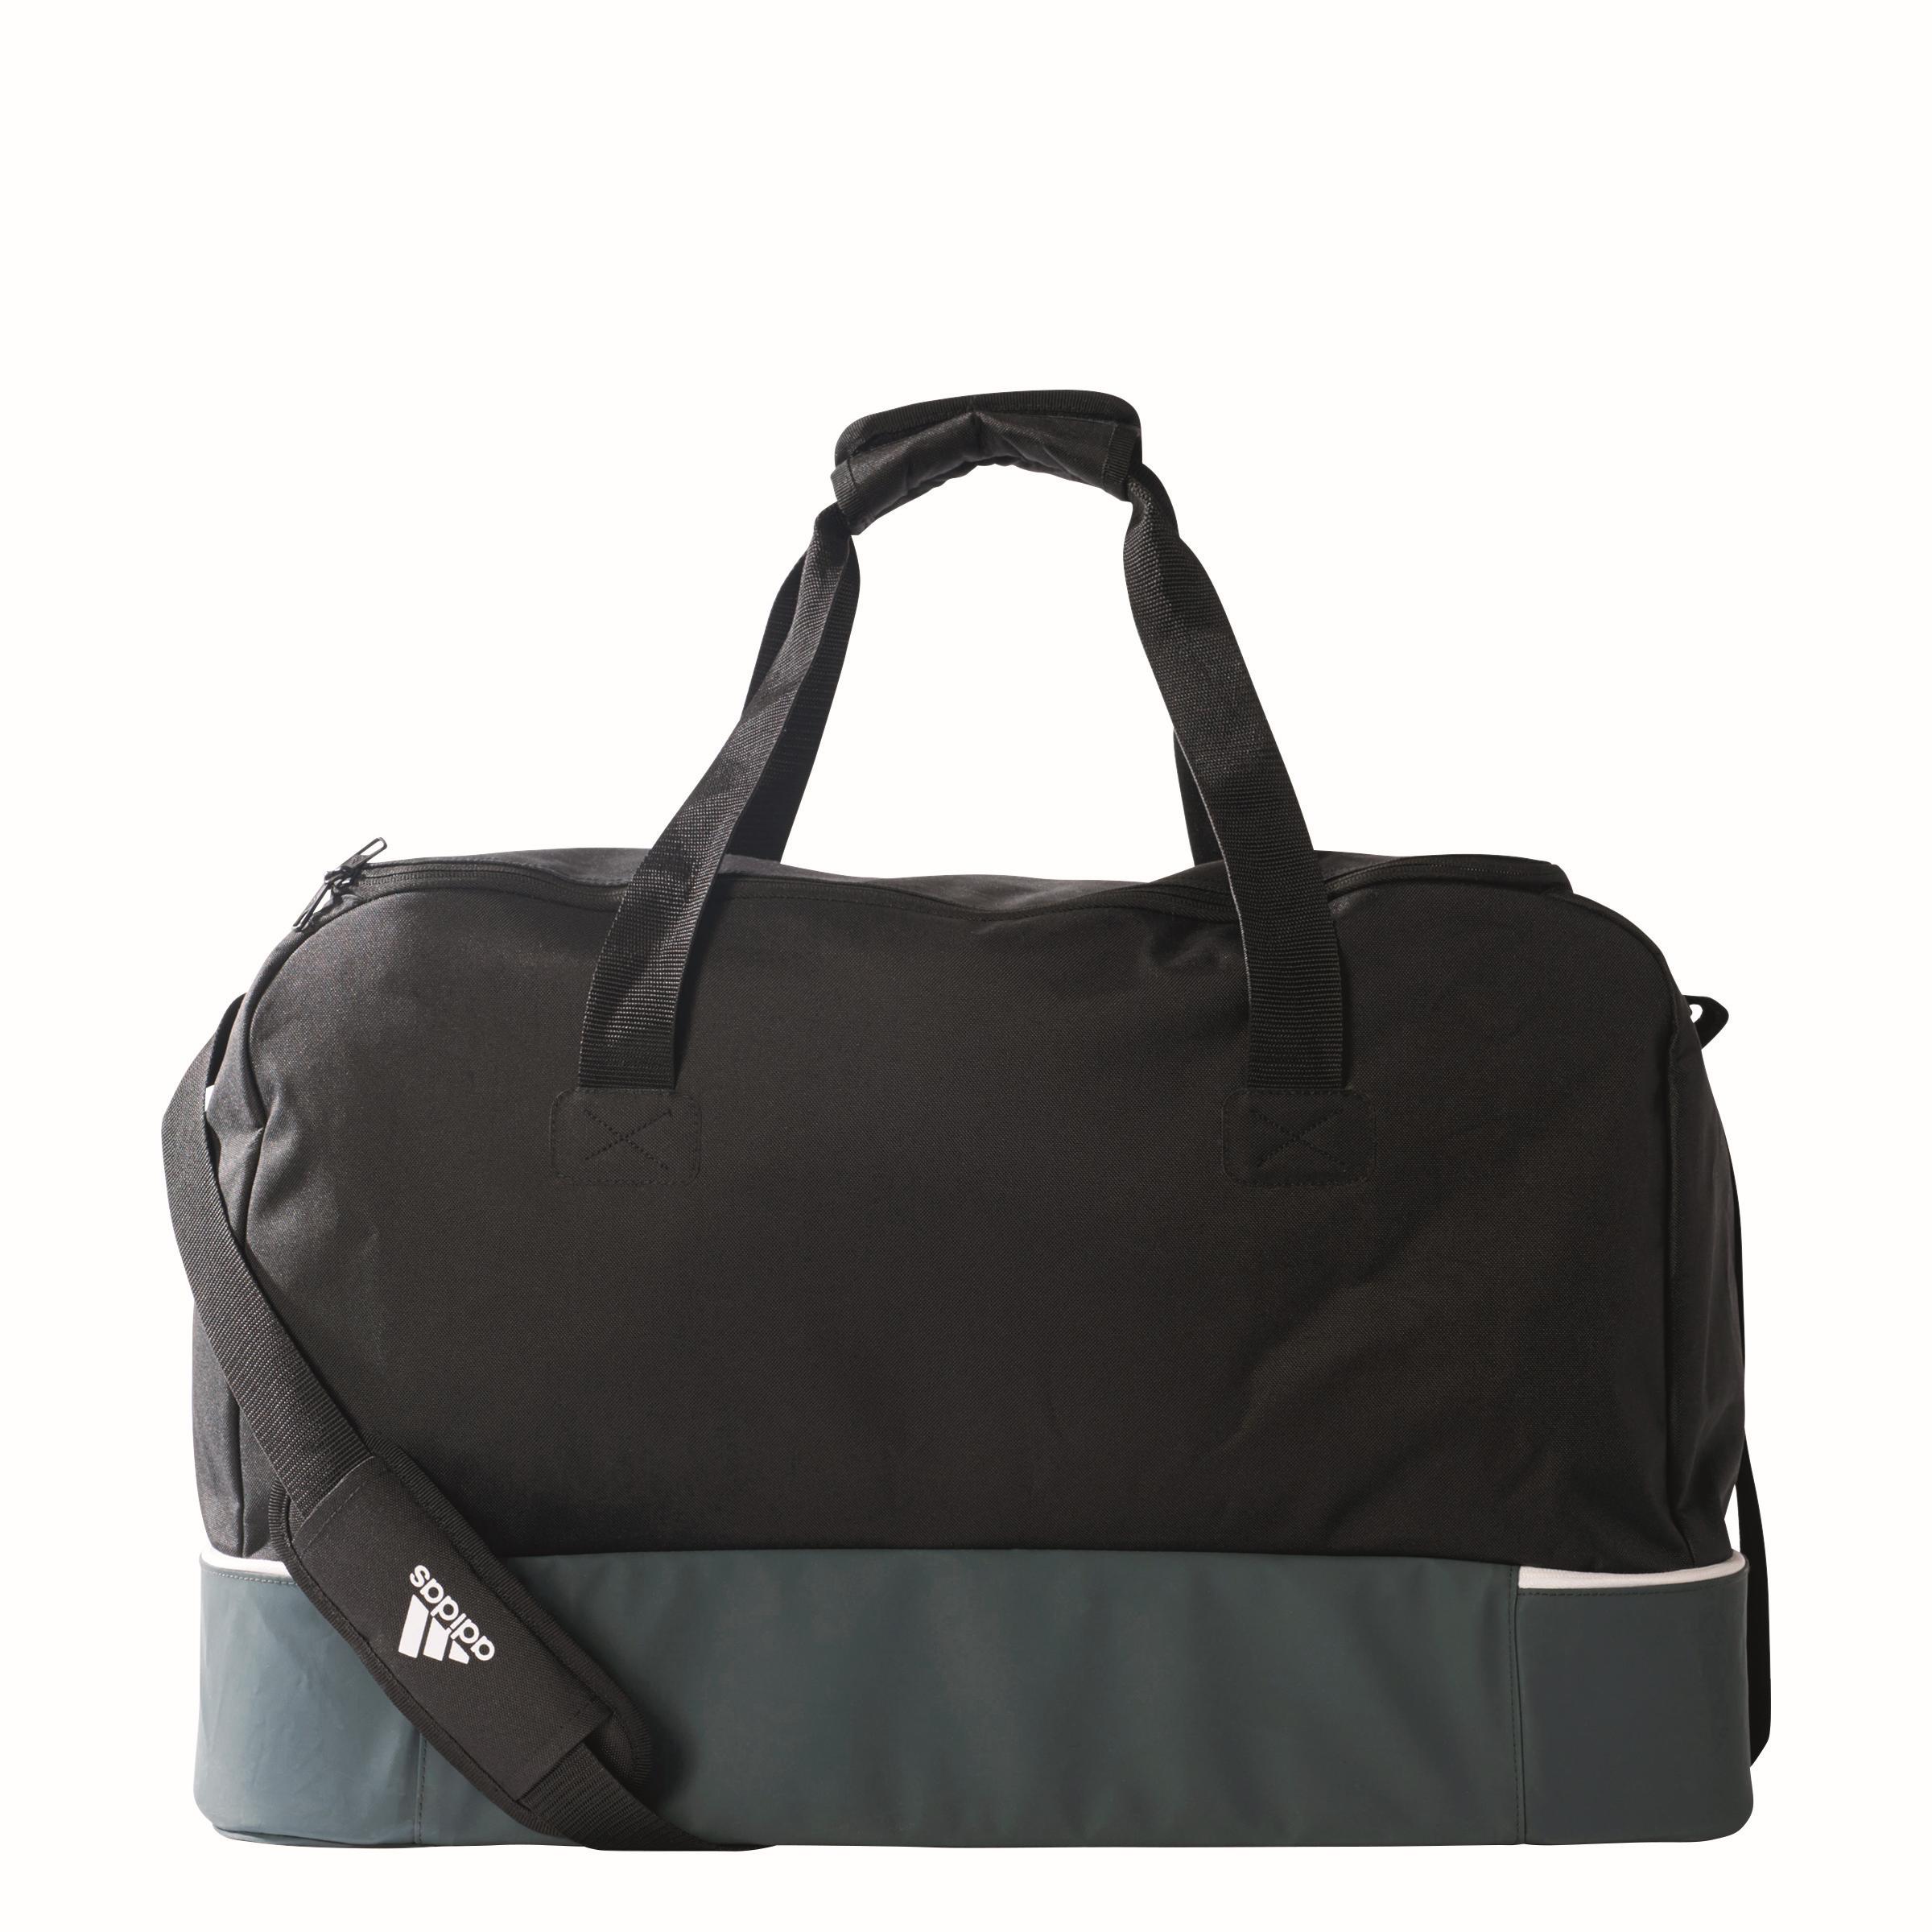 57f56ba16b231 adidas Tiro Teambag - Large - Sporttasche mit Bodenfach - B46122 ...